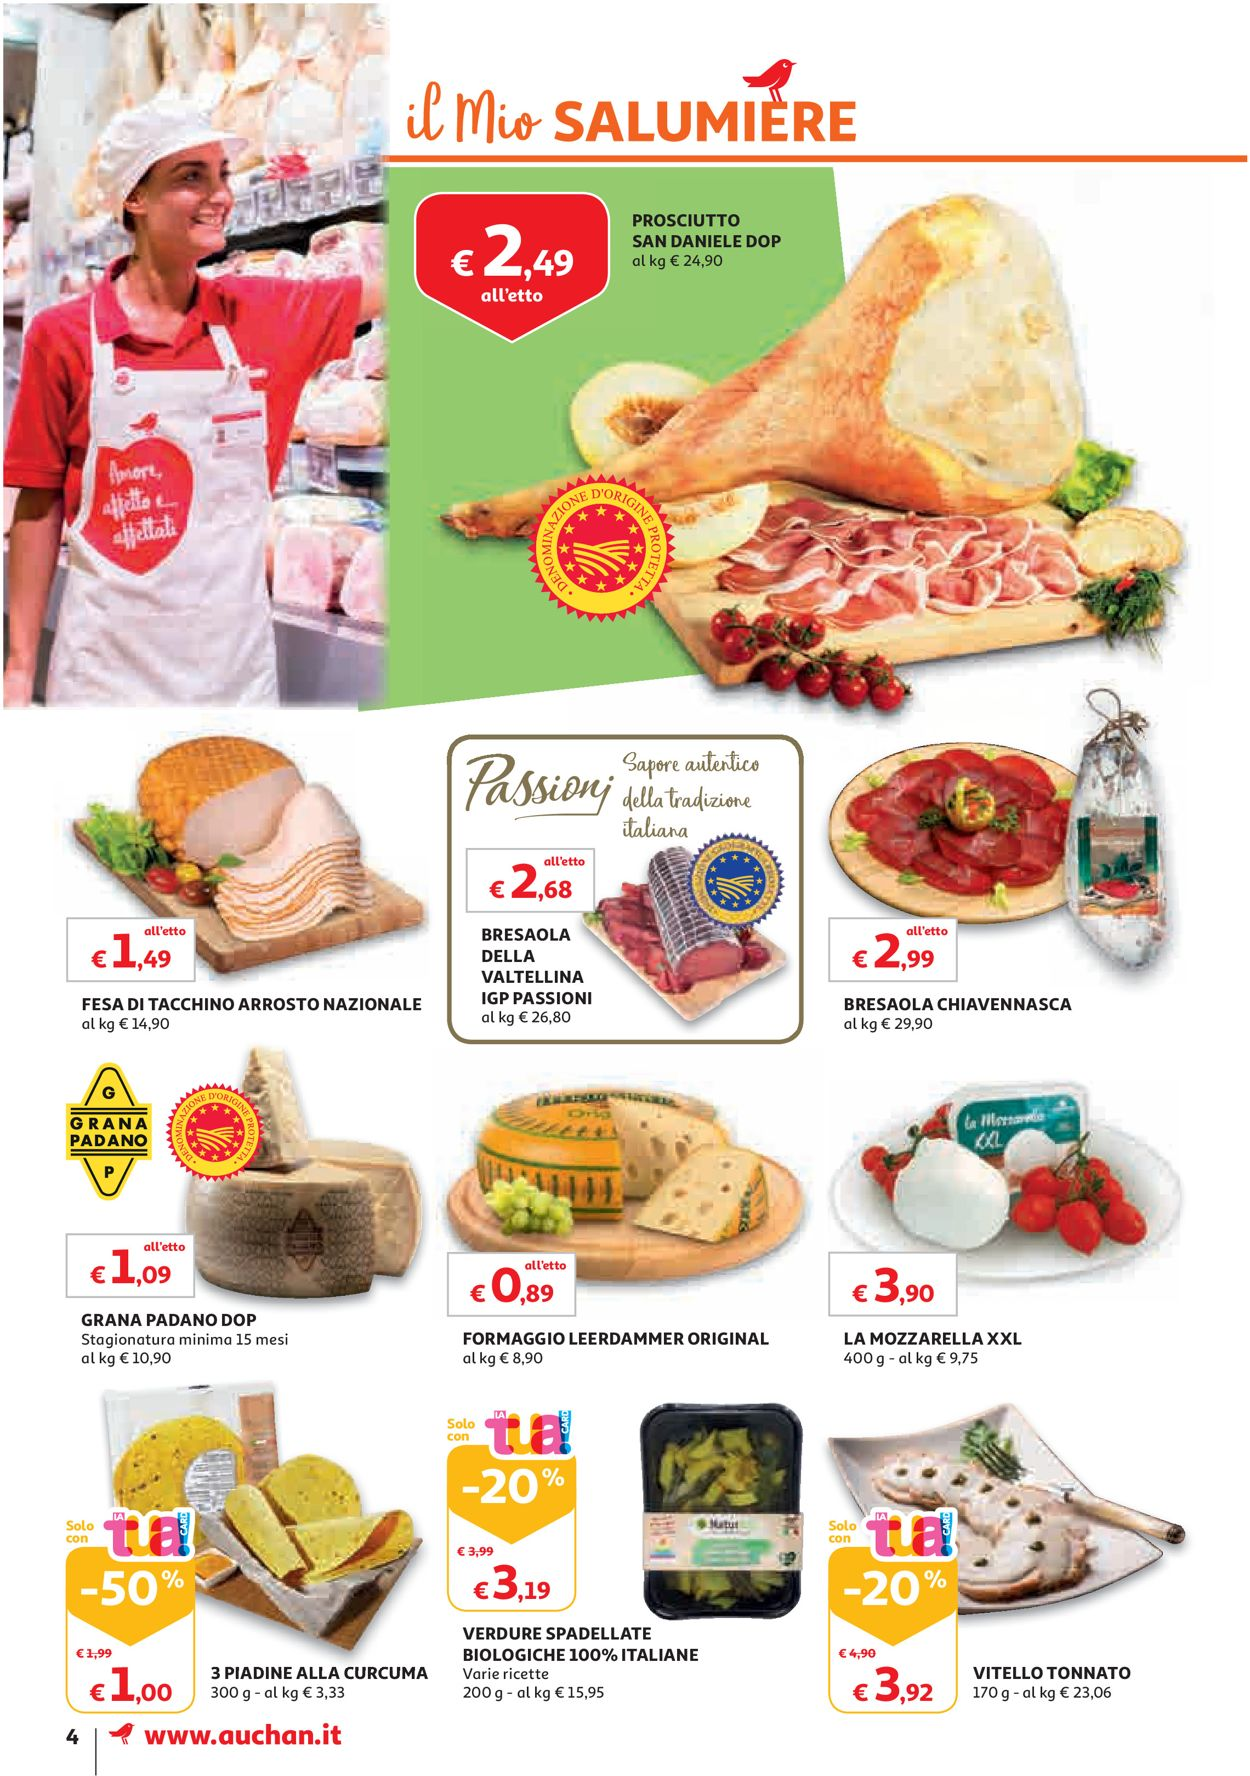 Volantino Auchan - Offerte 23/07-31/07/2019 (Pagina 4)